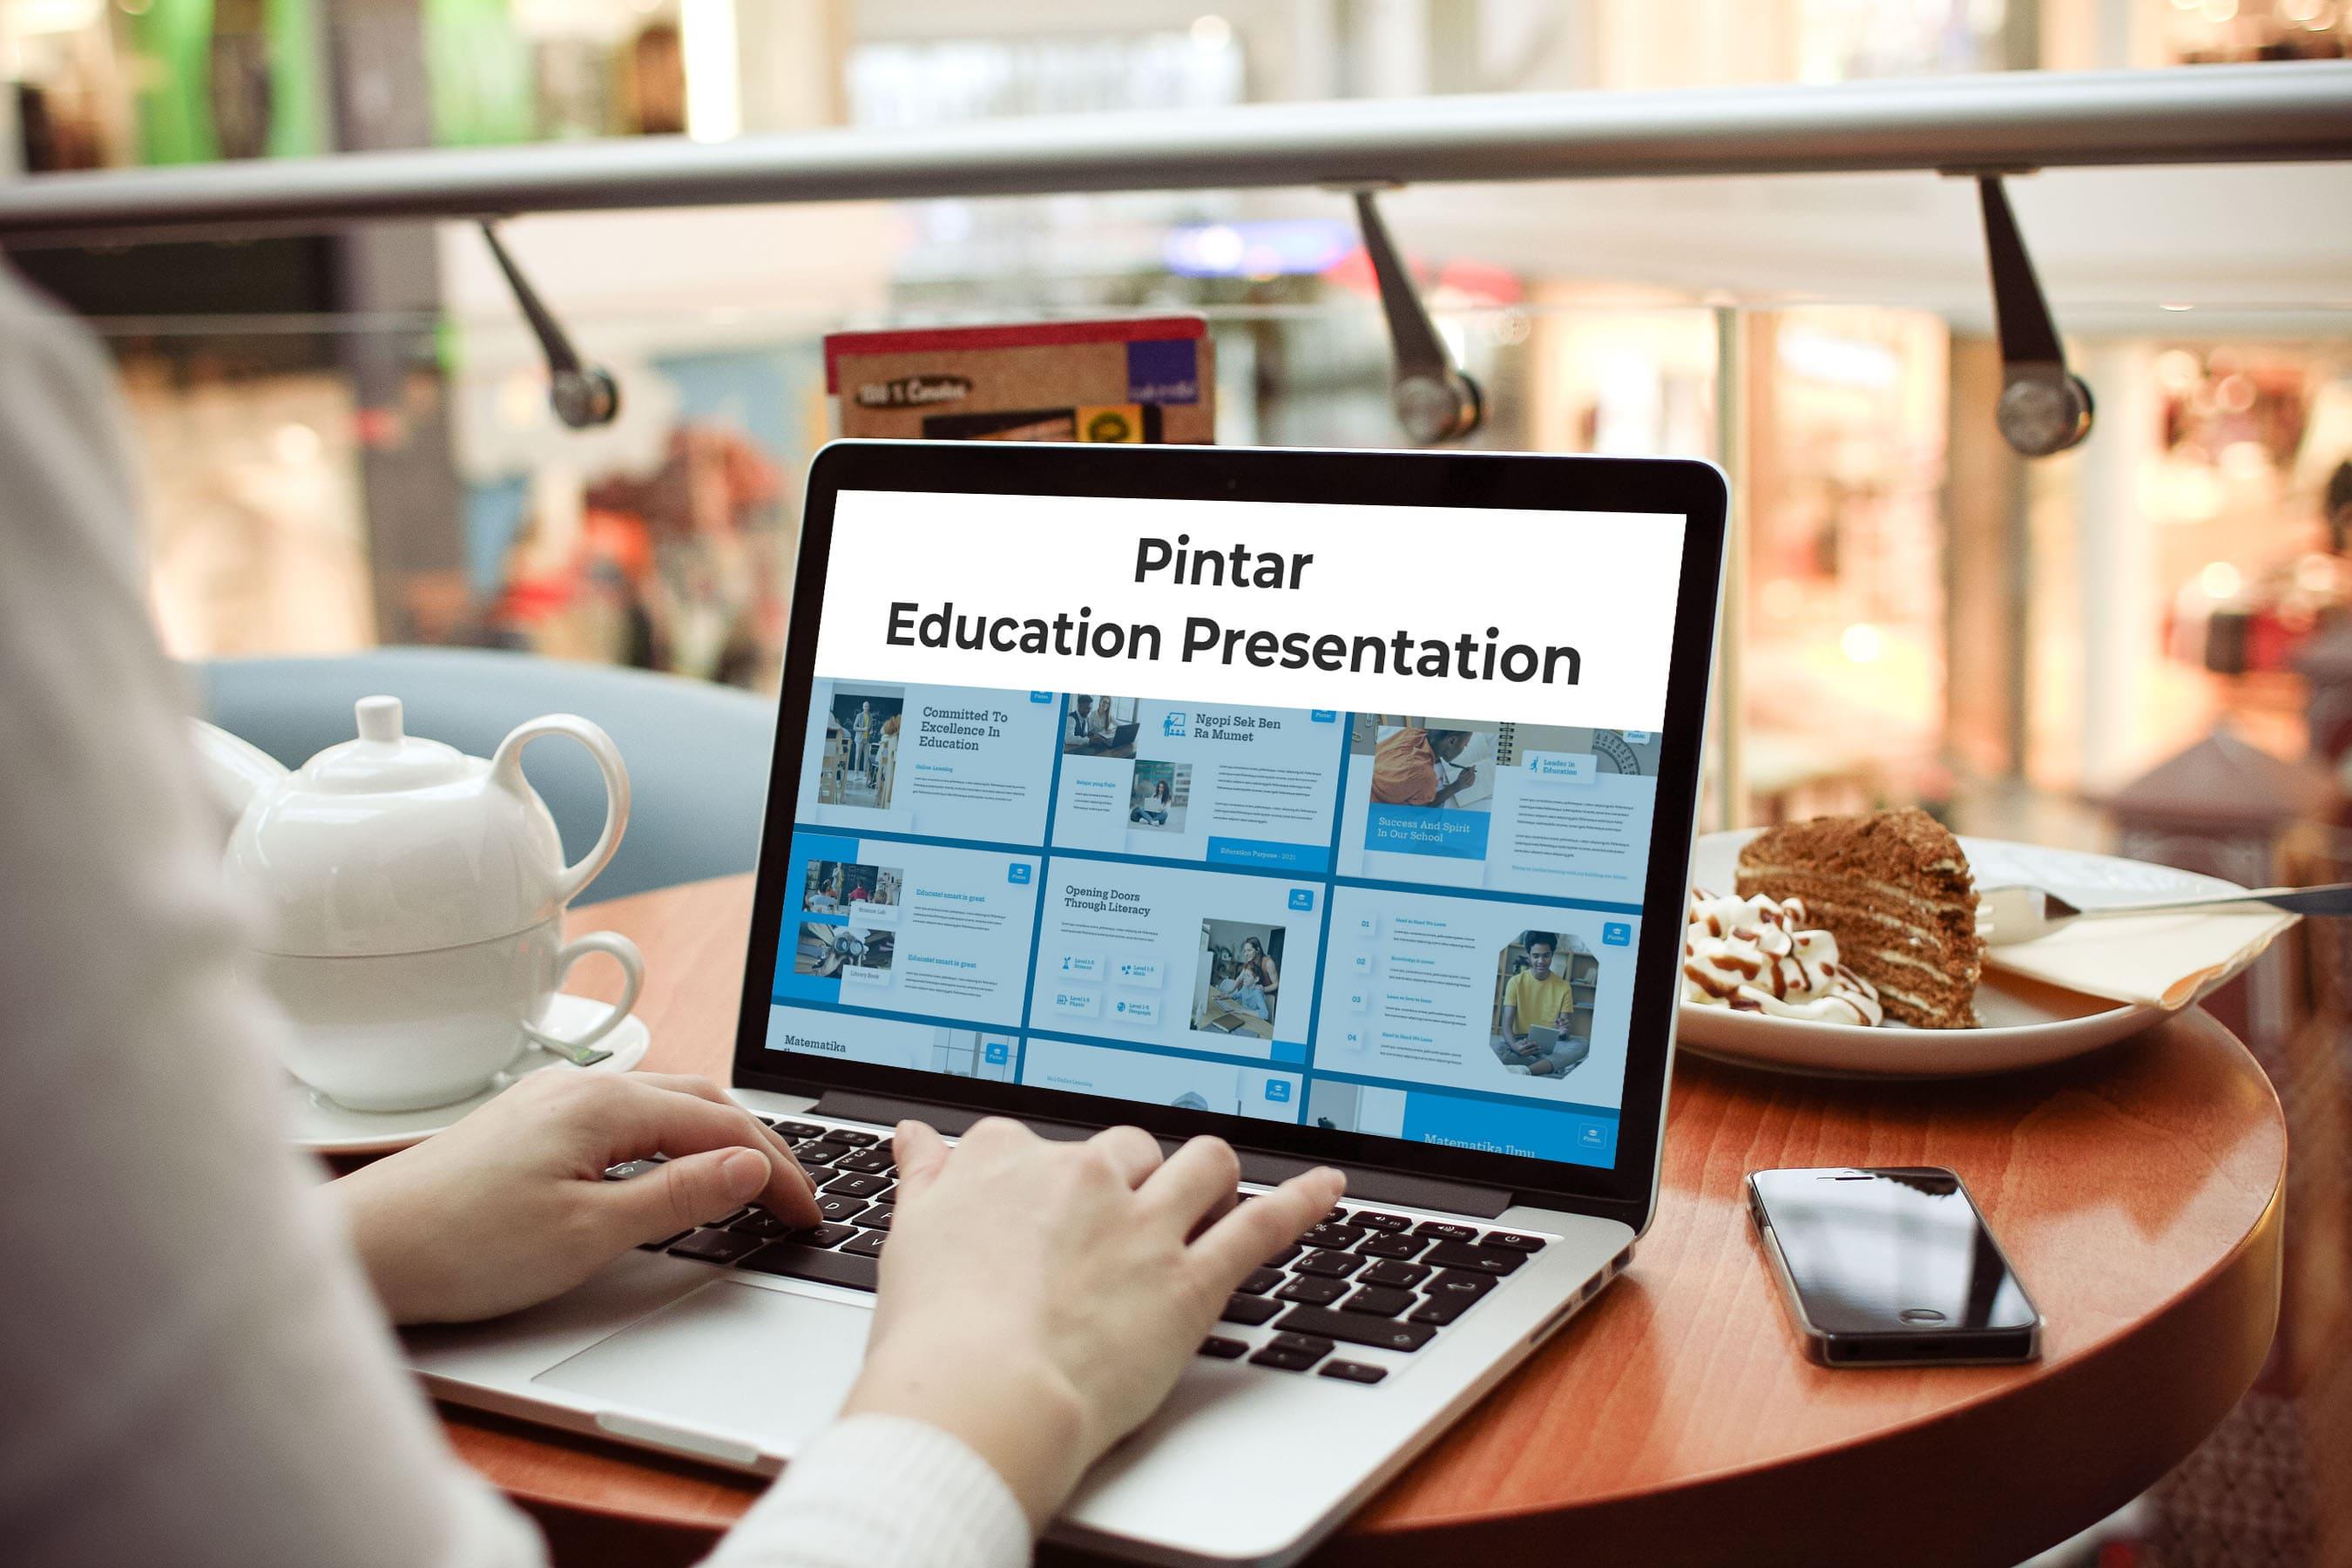 Pintar presentation on the laptop.